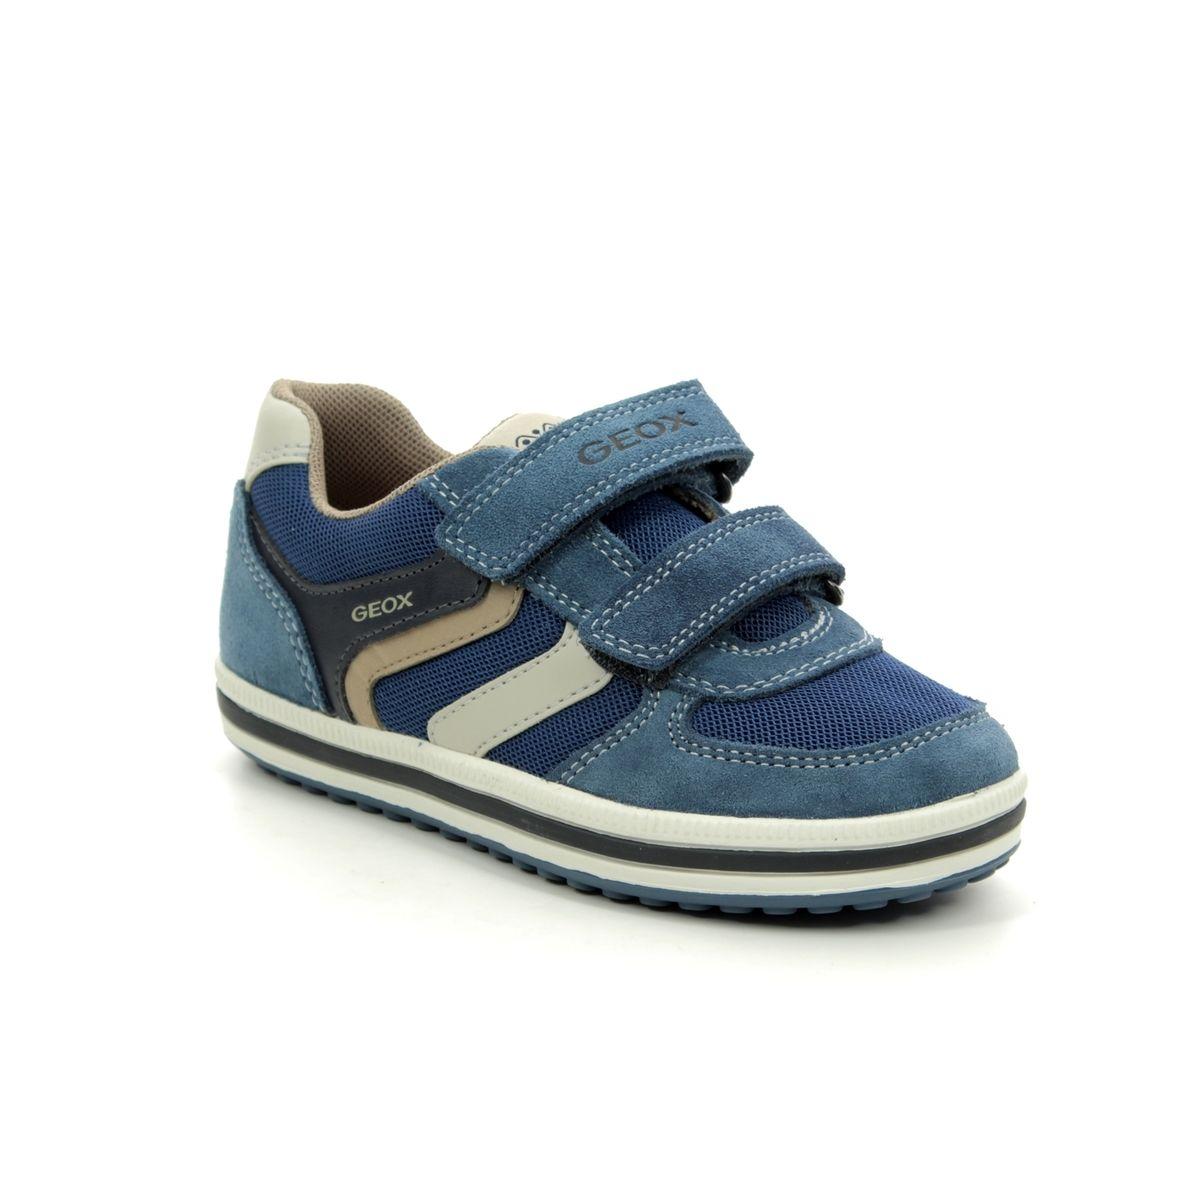 Geox Unisex-Child VITA 31 Sneaker